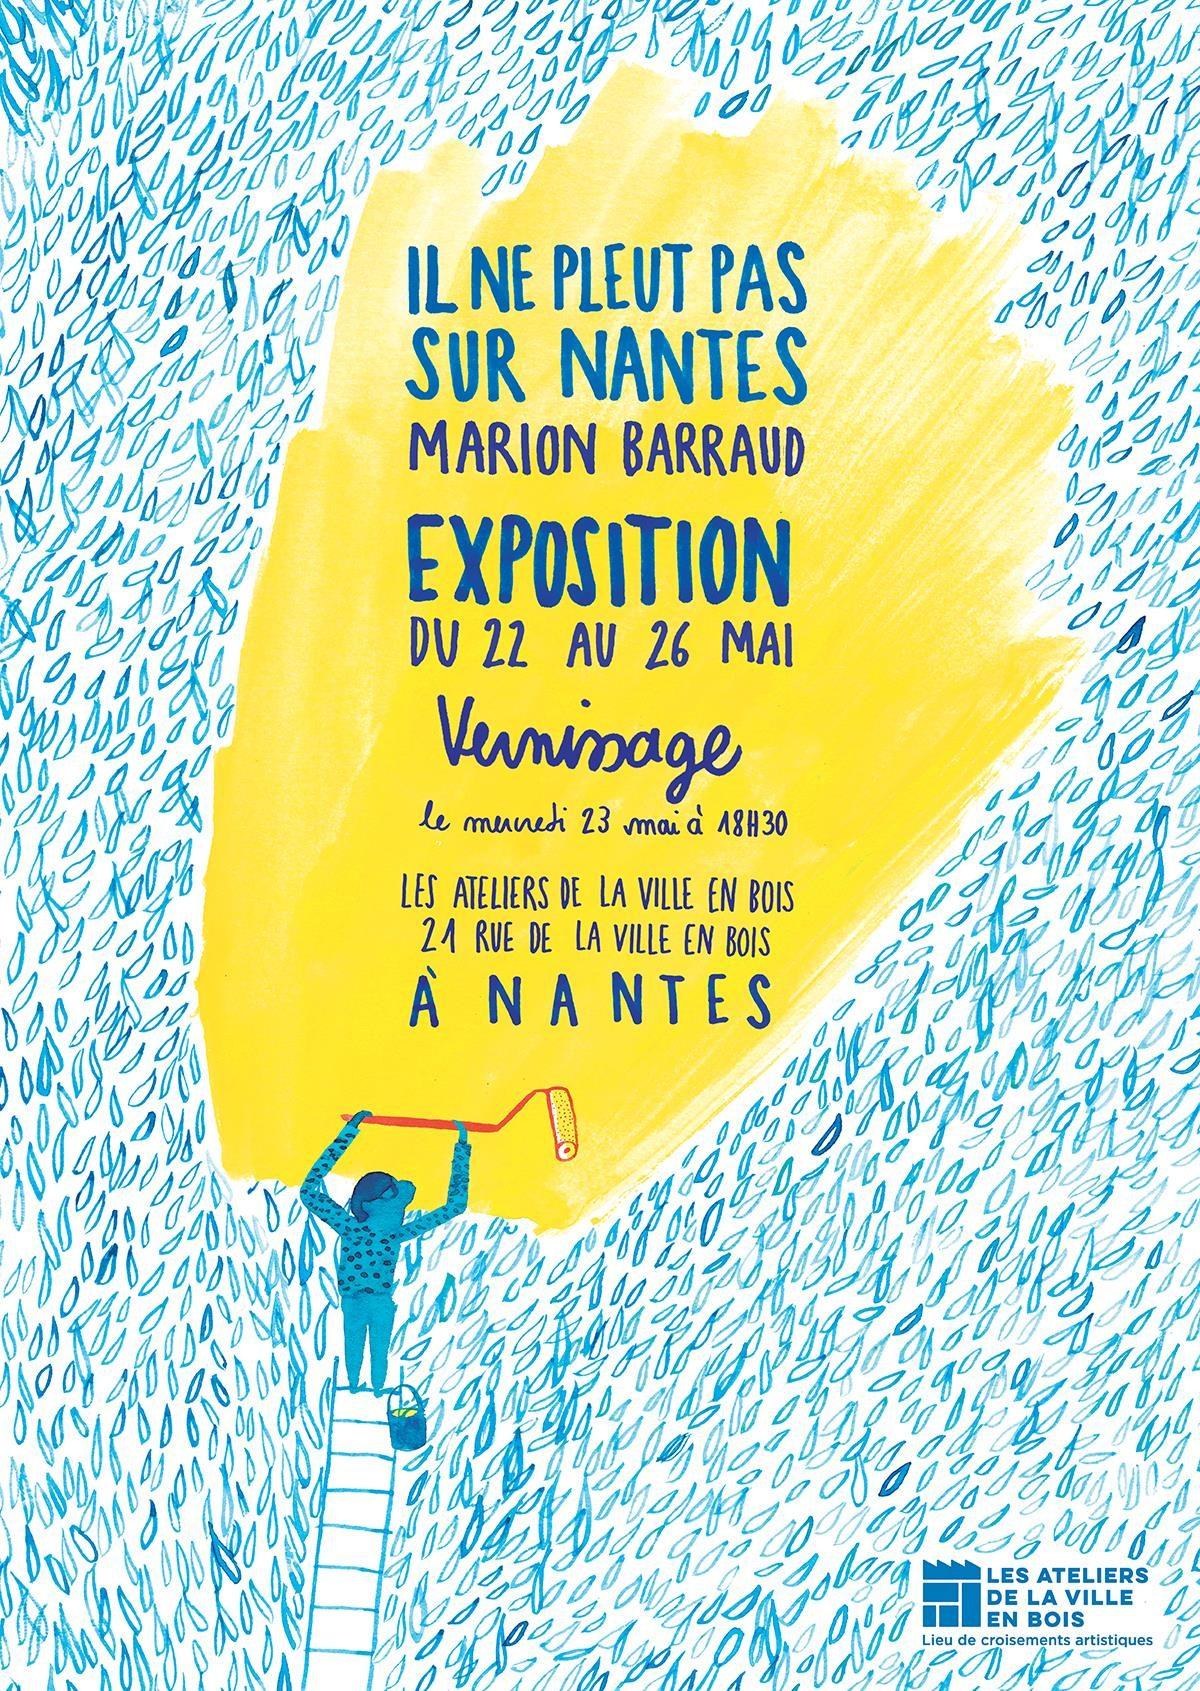 Exposition Marion Barraud